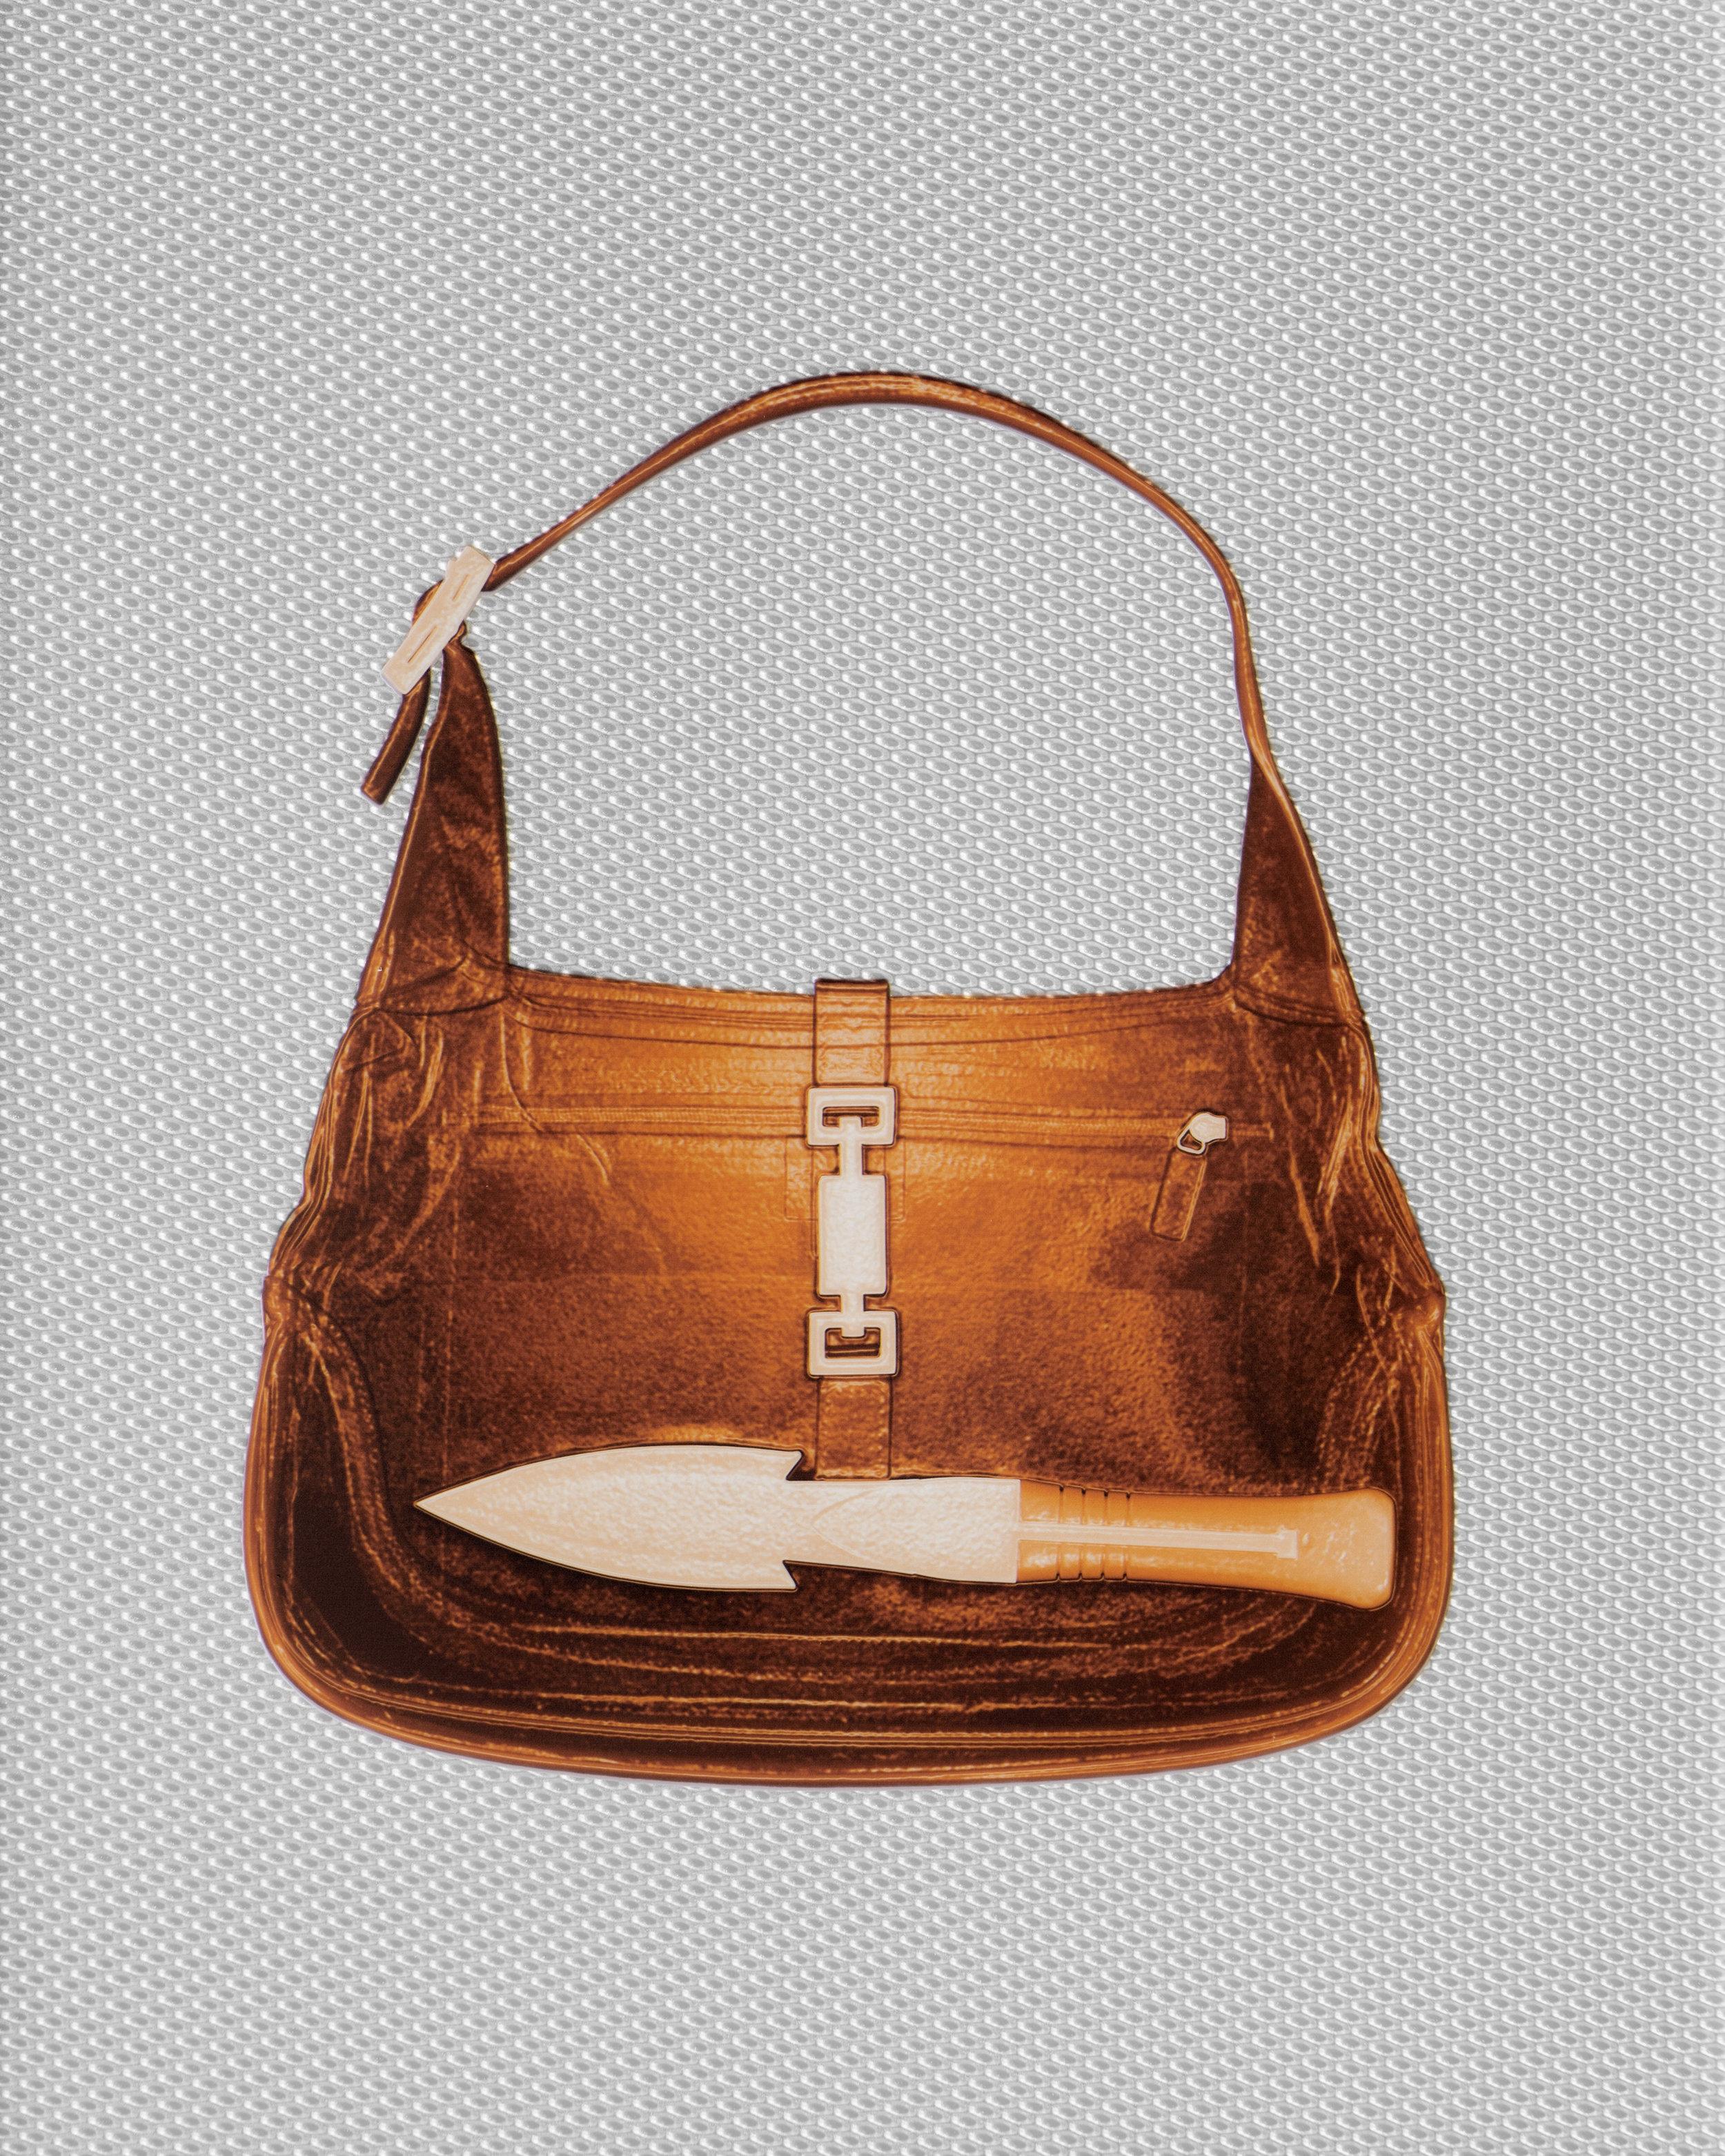 Amber Gucci Handbag With Knife